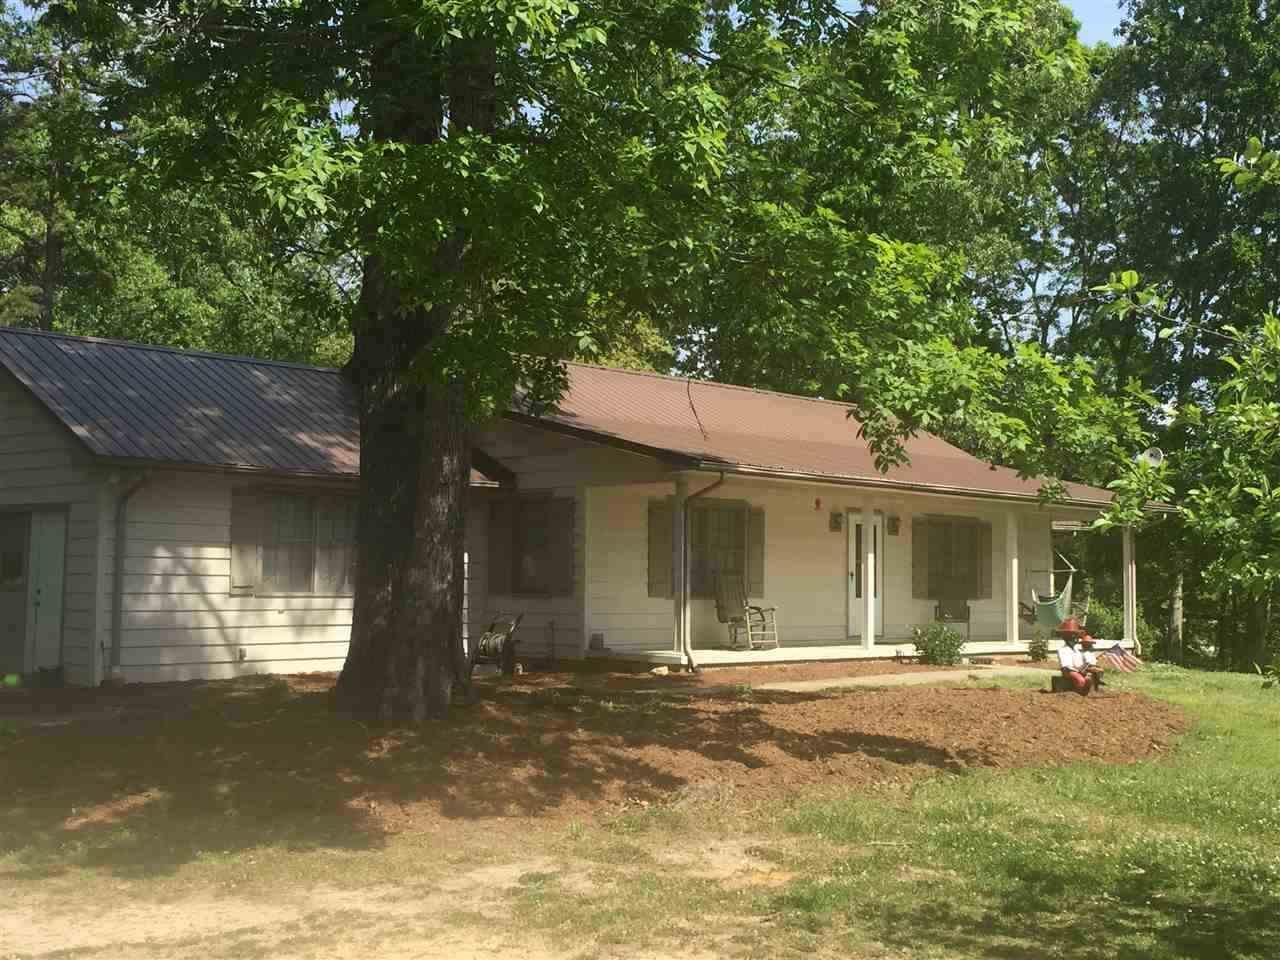 110 Country Acres, Walhalla, SC 29691 (MLS #20176010) :: Les Walden Real Estate